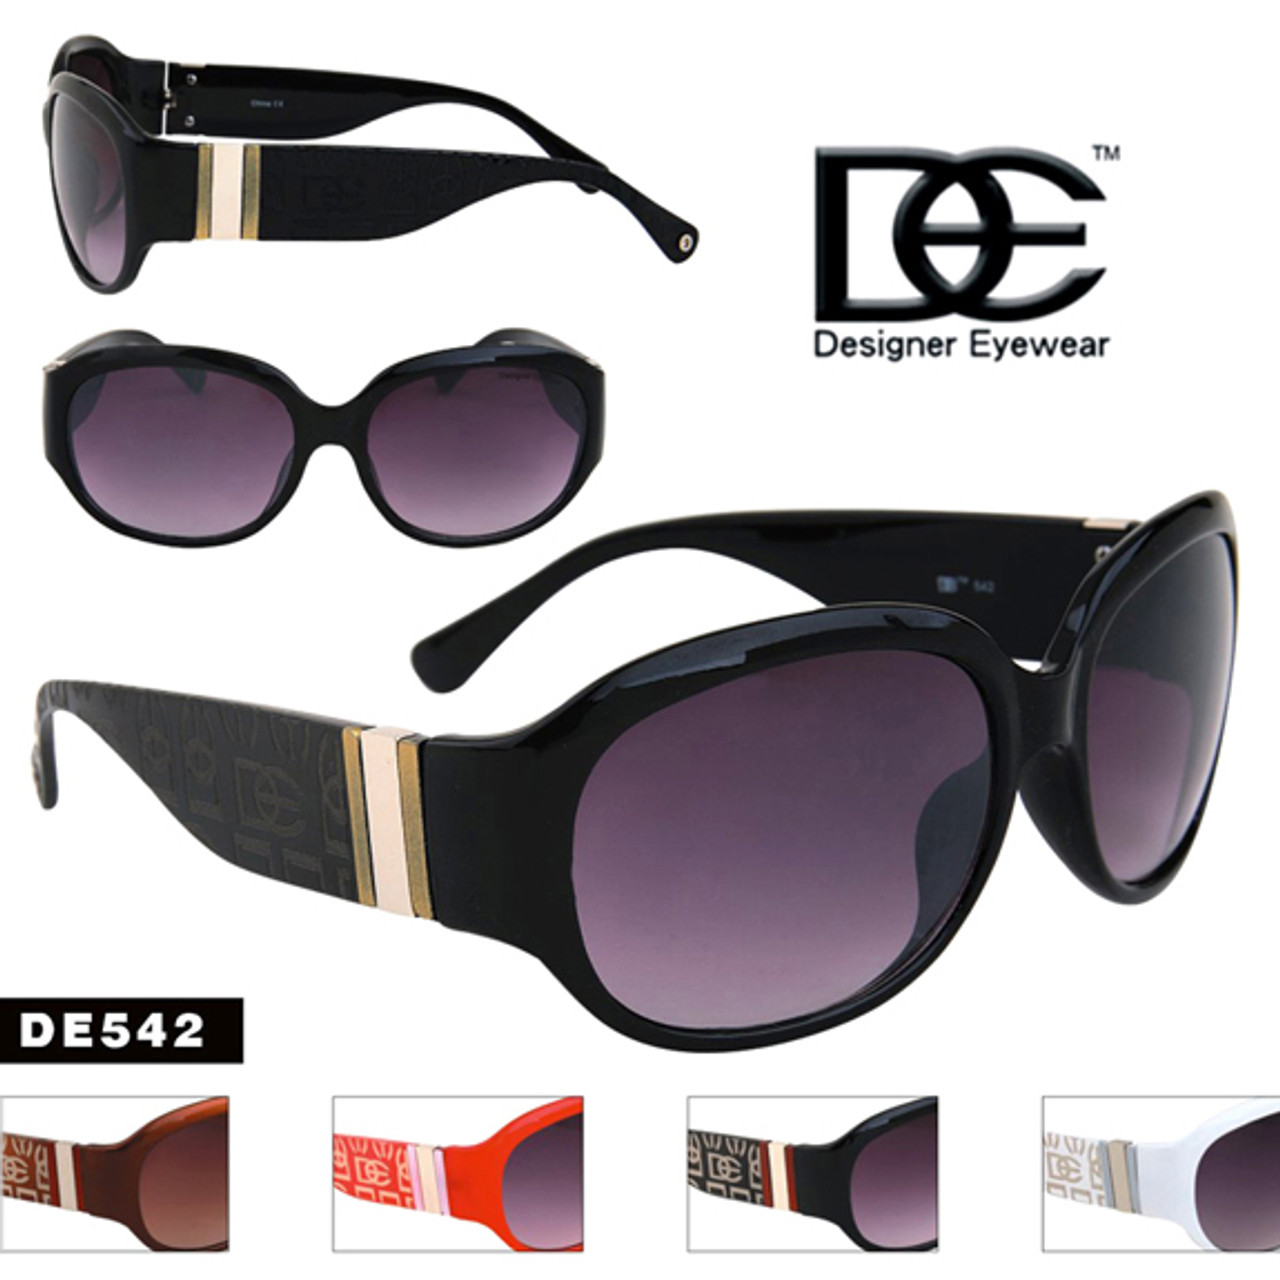 Fashion Sunglasses Wholesale DE Designer Eyewear